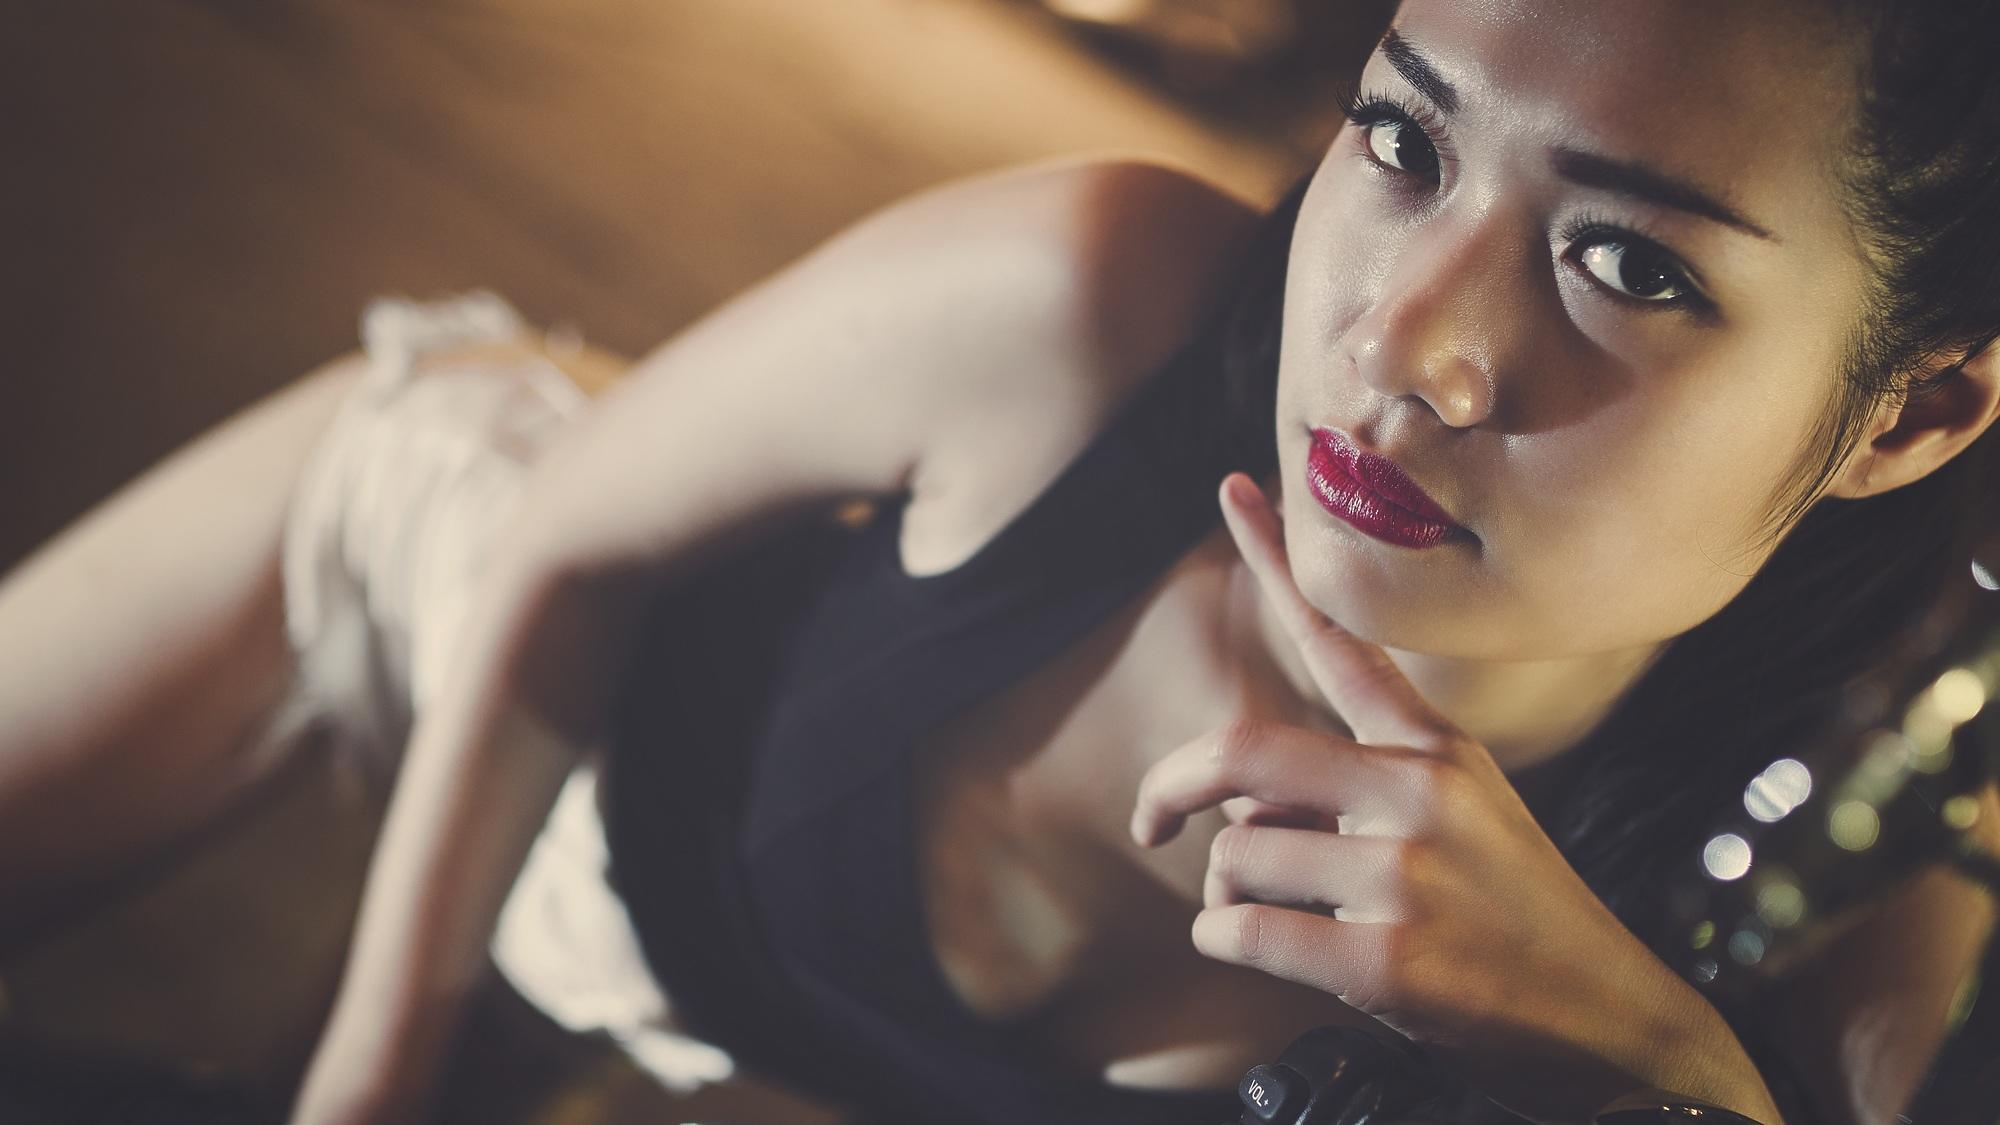 kik sex apps 1 - Sexting Online Sites: Top Sexting Websites in 2020